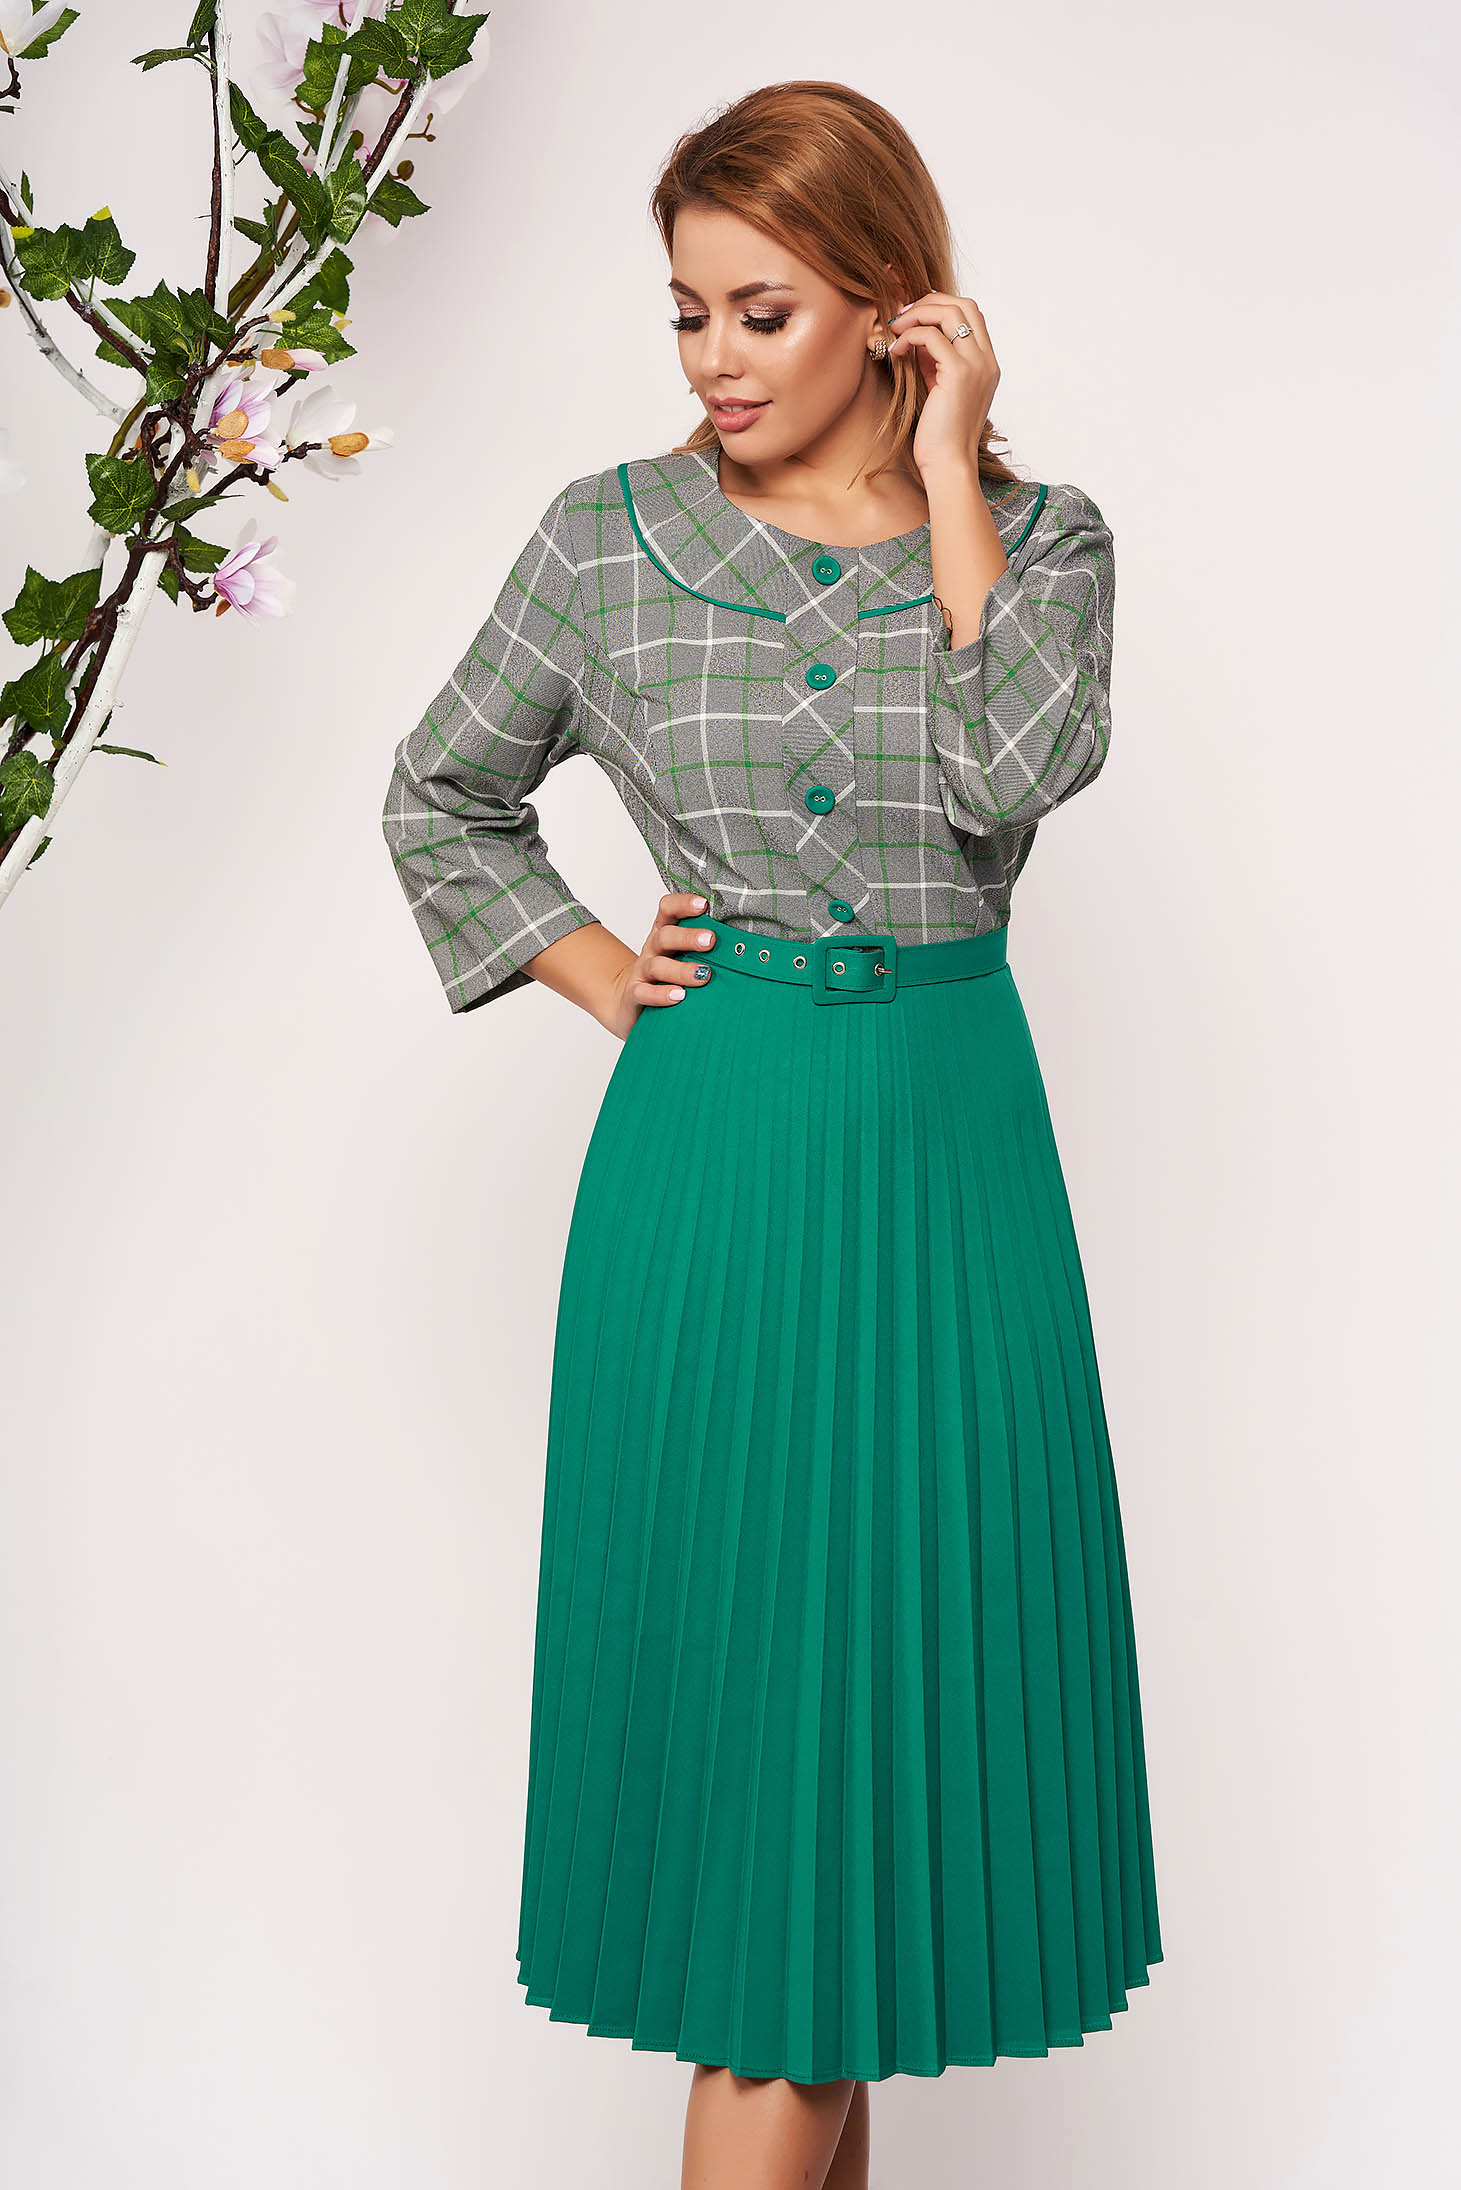 Rochie verde office midi in clos cu maneci trei-sferturi si fusta plisata